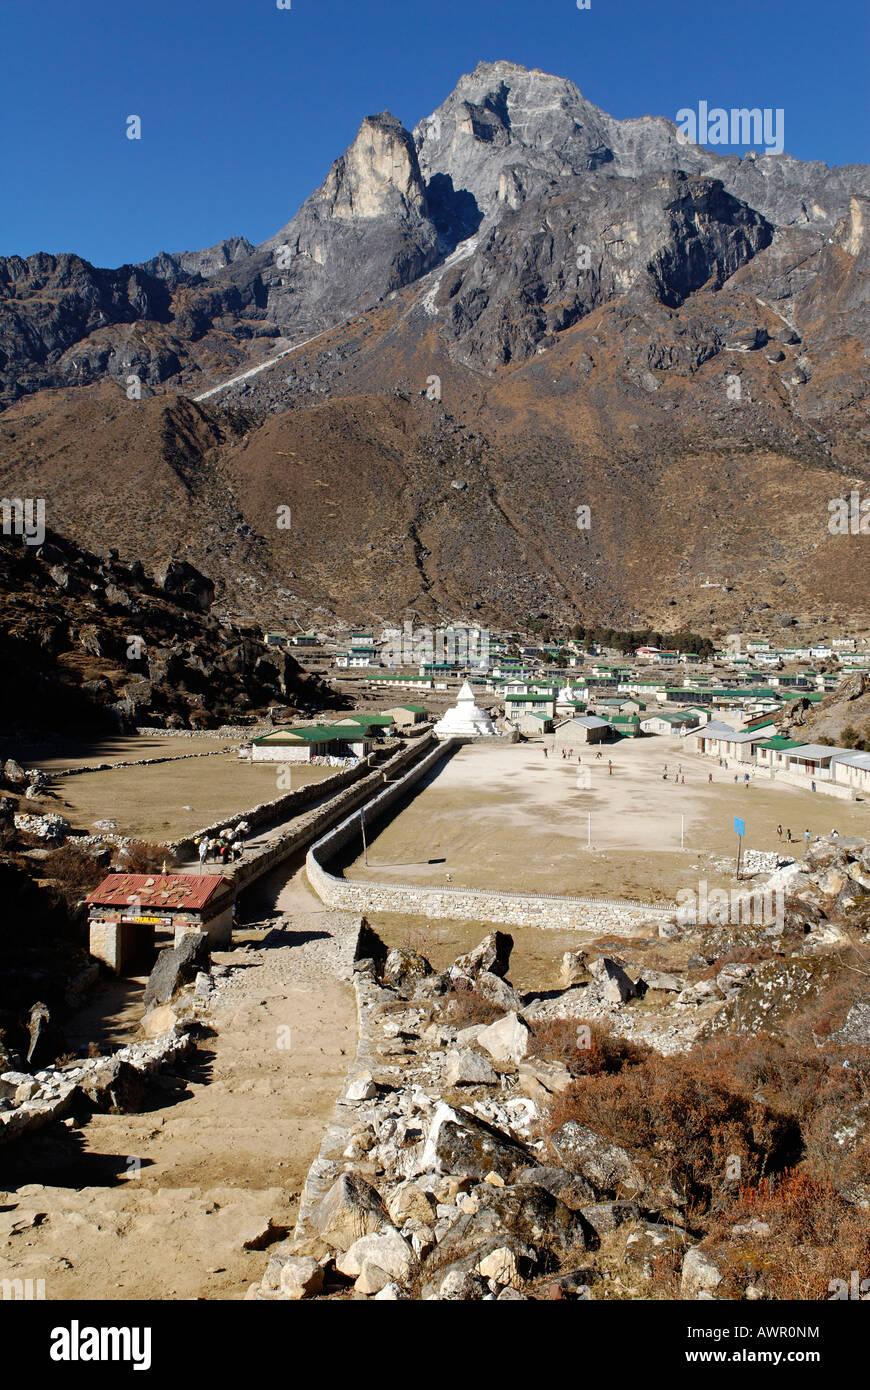 Sherpa village Khumjung, holy mountain Khumbi Yul Lha (Khumbila, 5761), Sagarmatha National Park, Khumbu Himal, - Stock Image